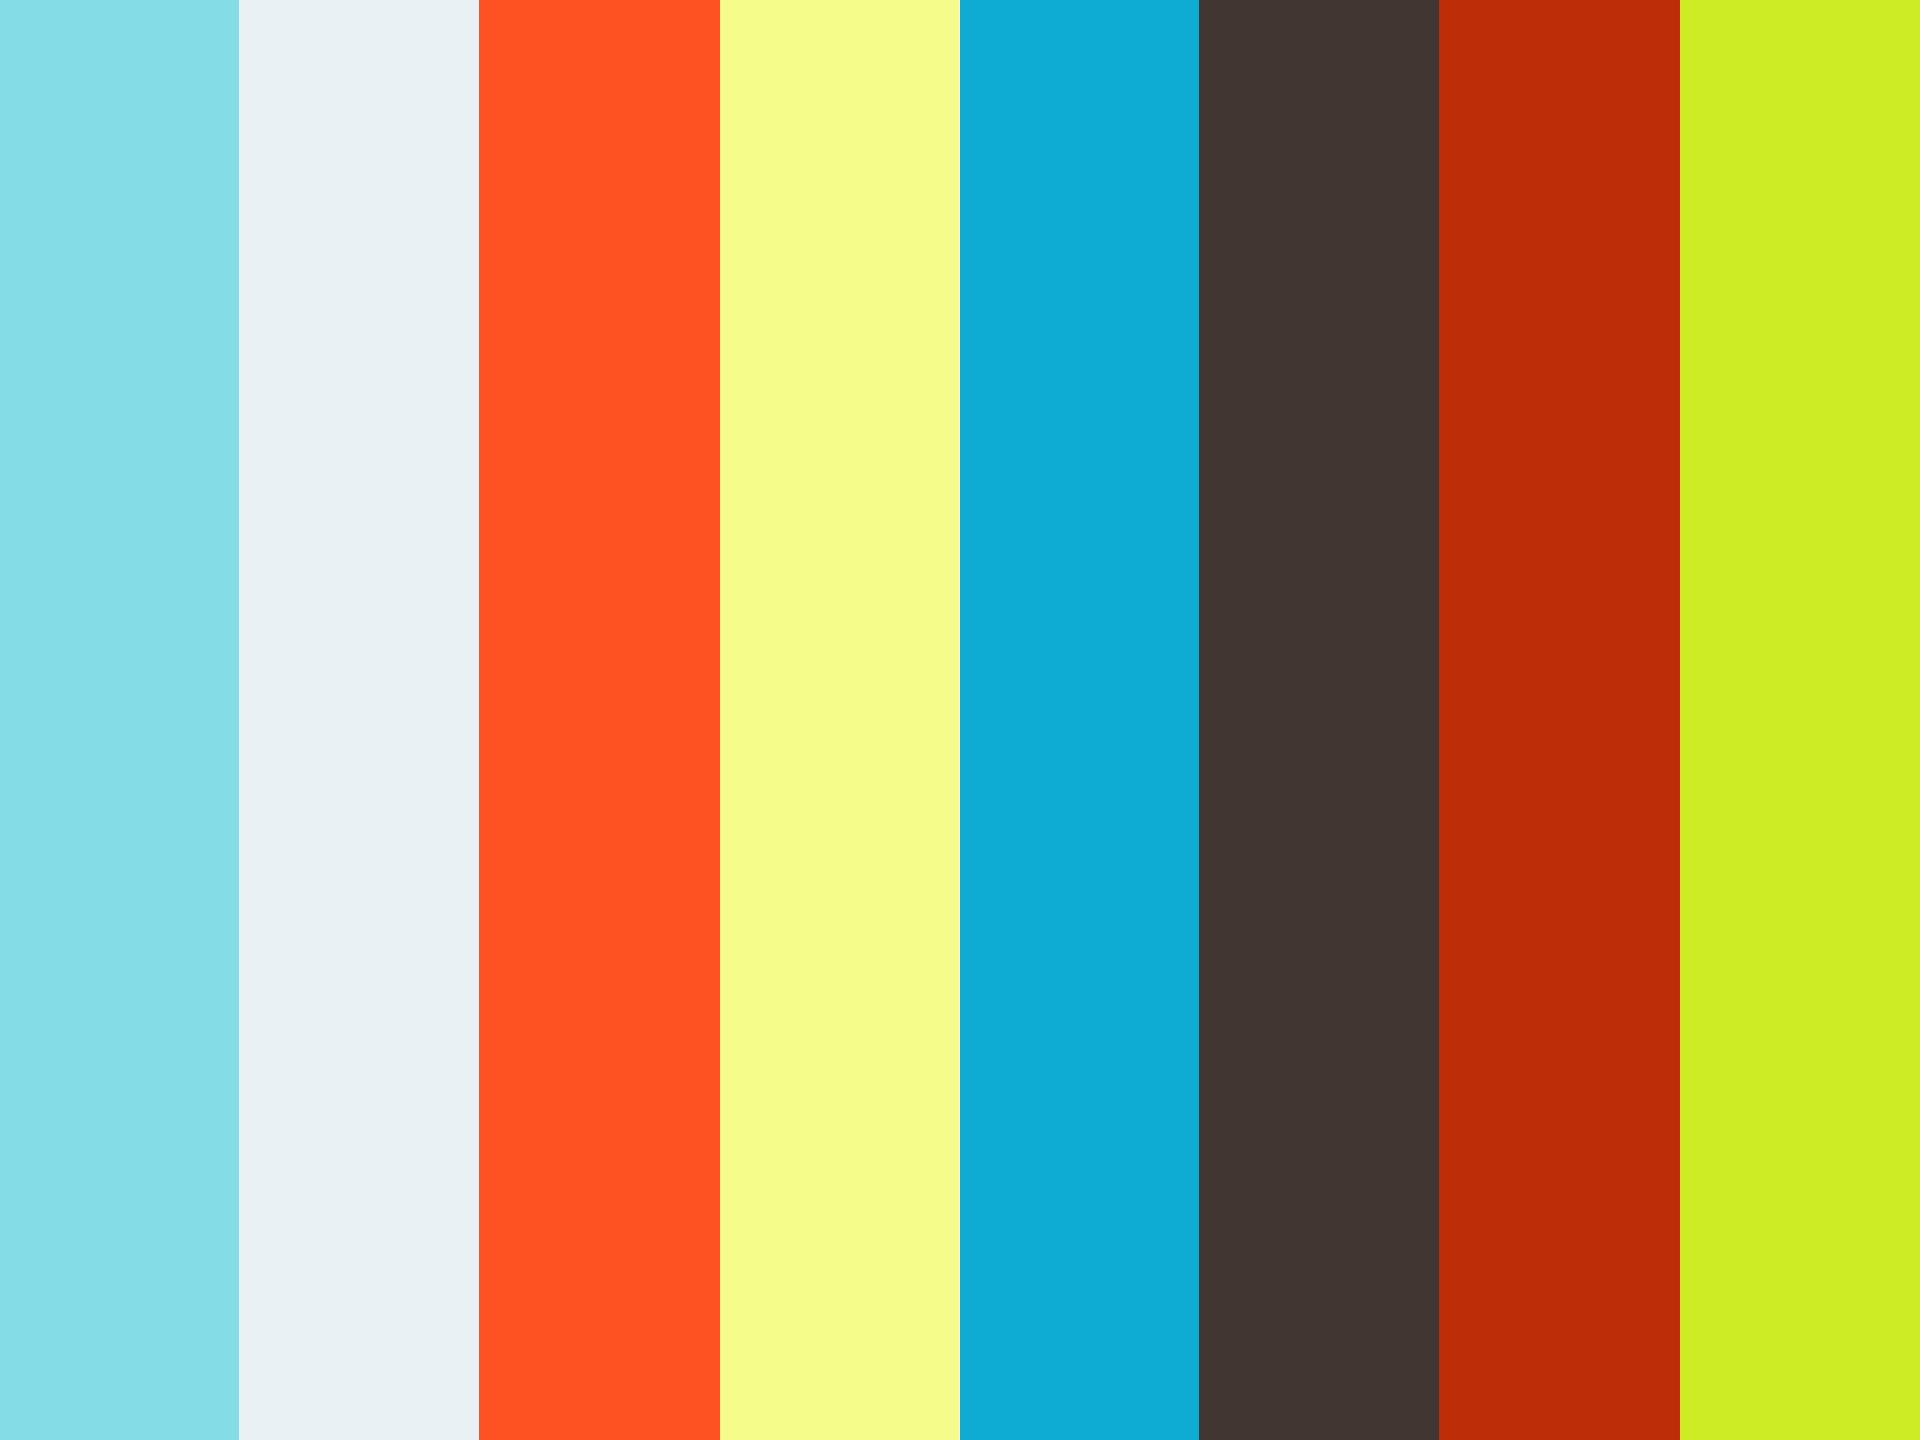 Nasdaq 100 Chart: Boenning 6 Scattergood Rings the NASDAQ Opening Bell on Vimeo,Chart